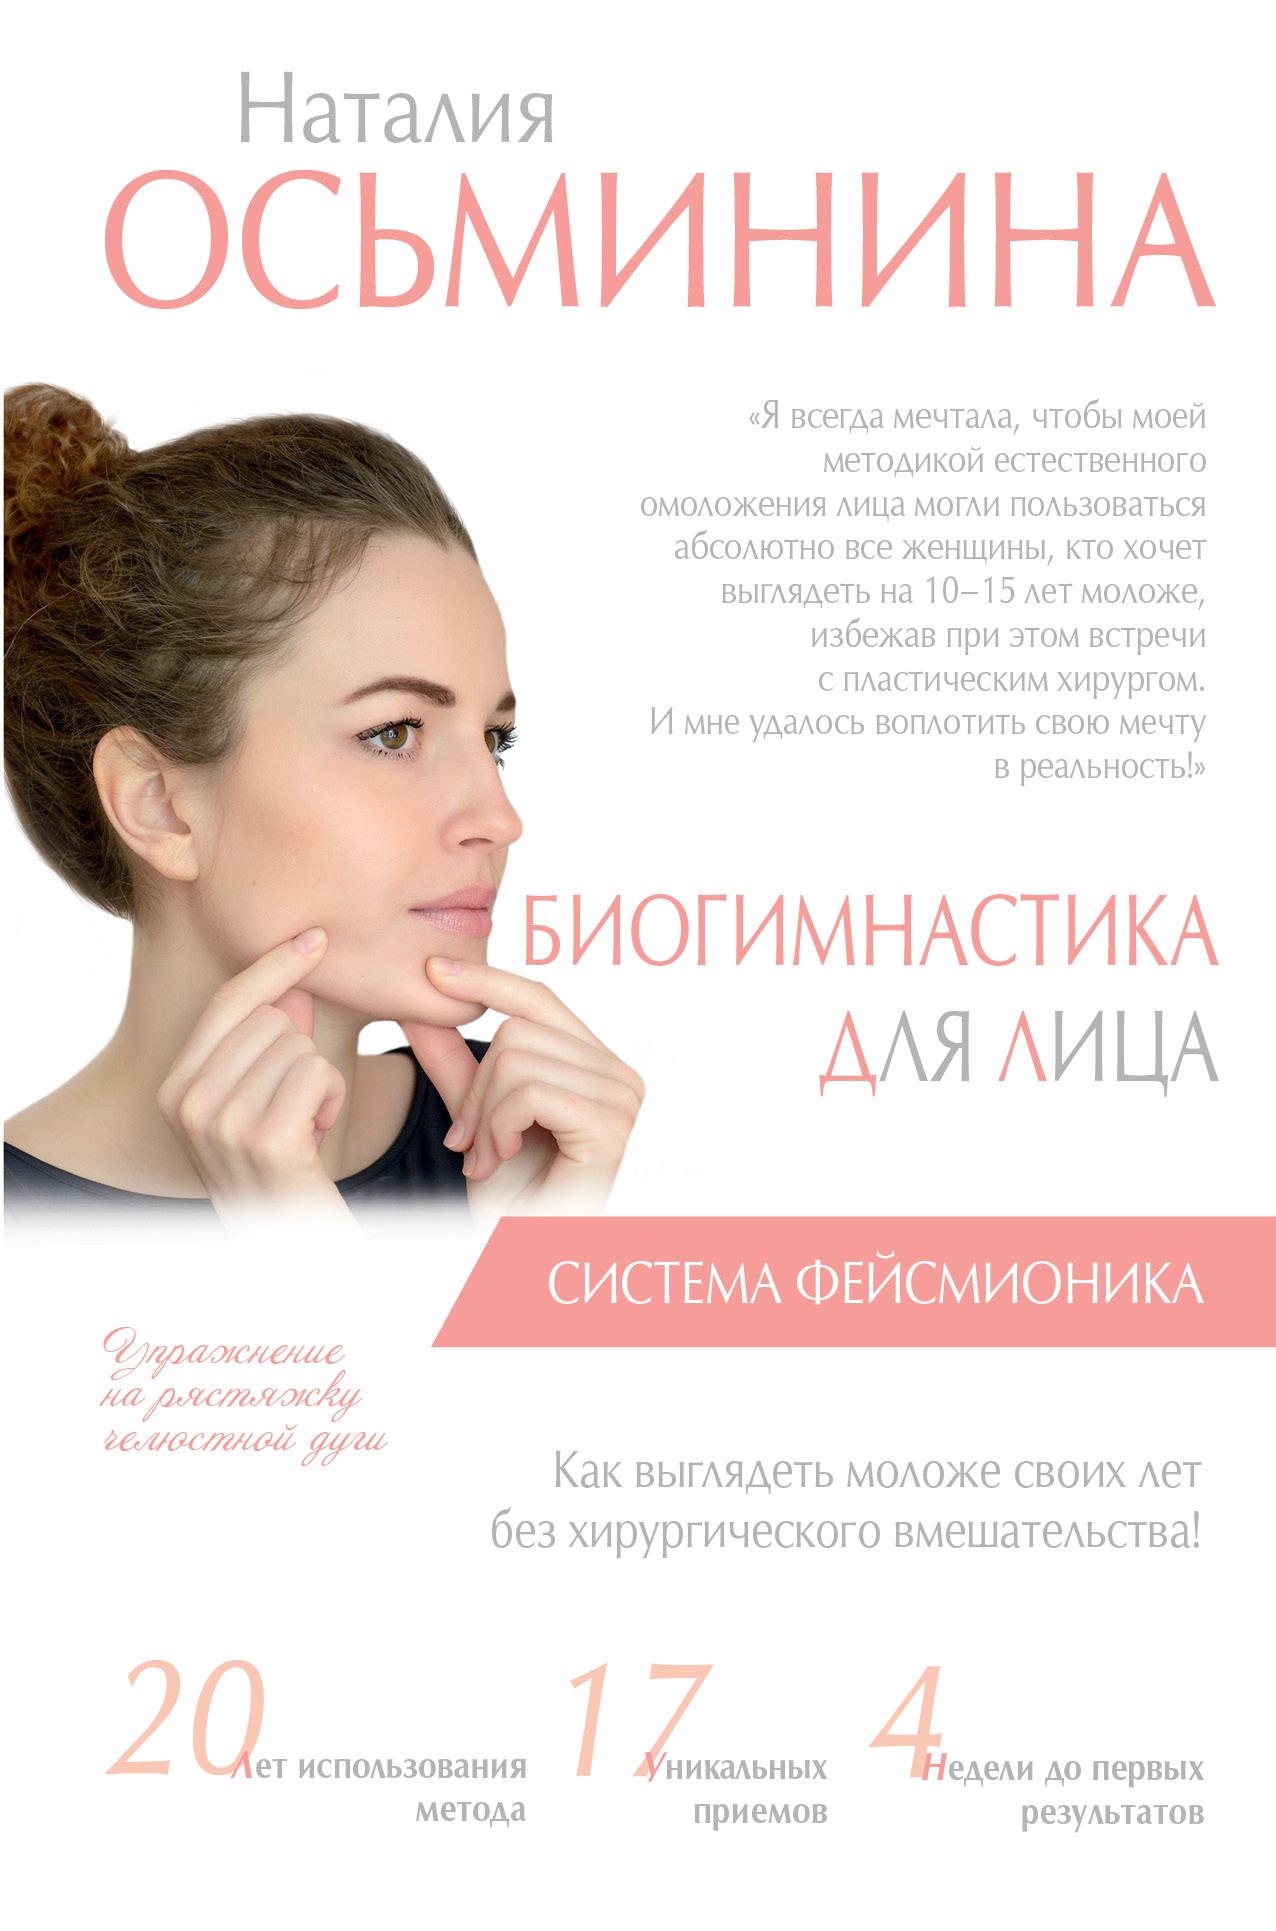 Наталия Осьминина Биогимнастика для лица. Система фейсмионика осьминина наталия борисовна биогимнастика для лица система фейсмионика